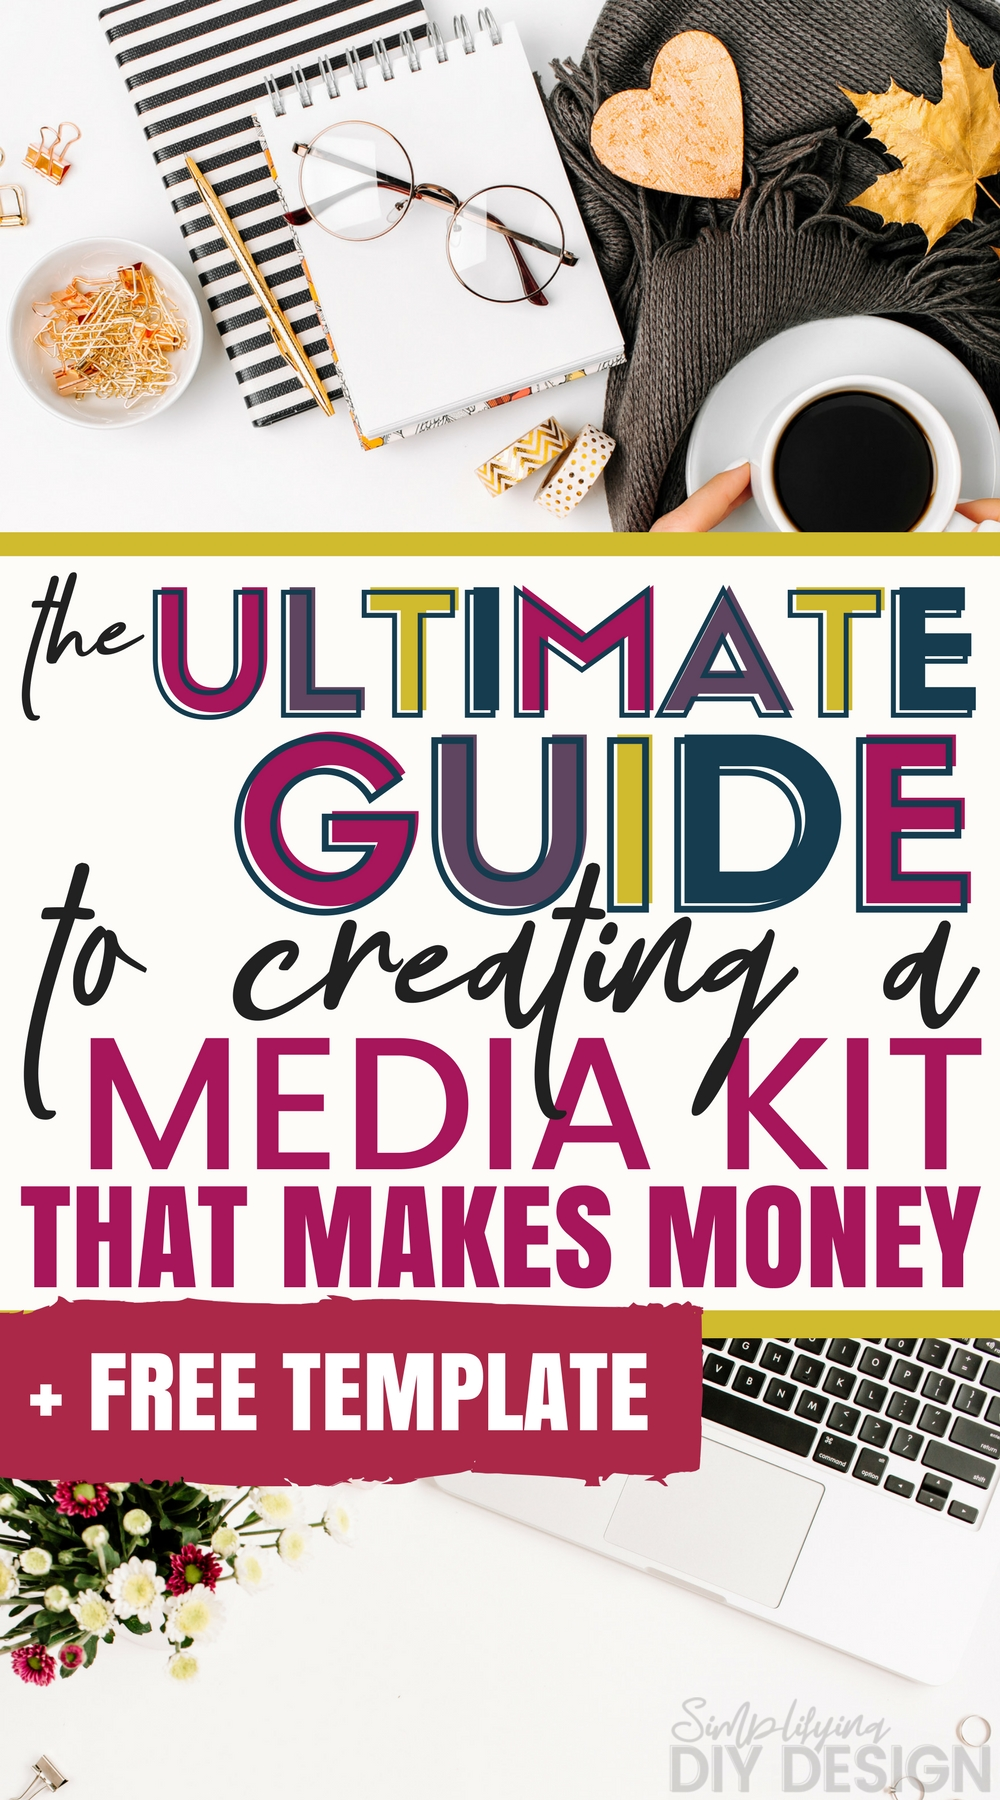 Create a media kit that makes money free media kit template start making money with you blog using our free media kit template customizable in canva maxwellsz